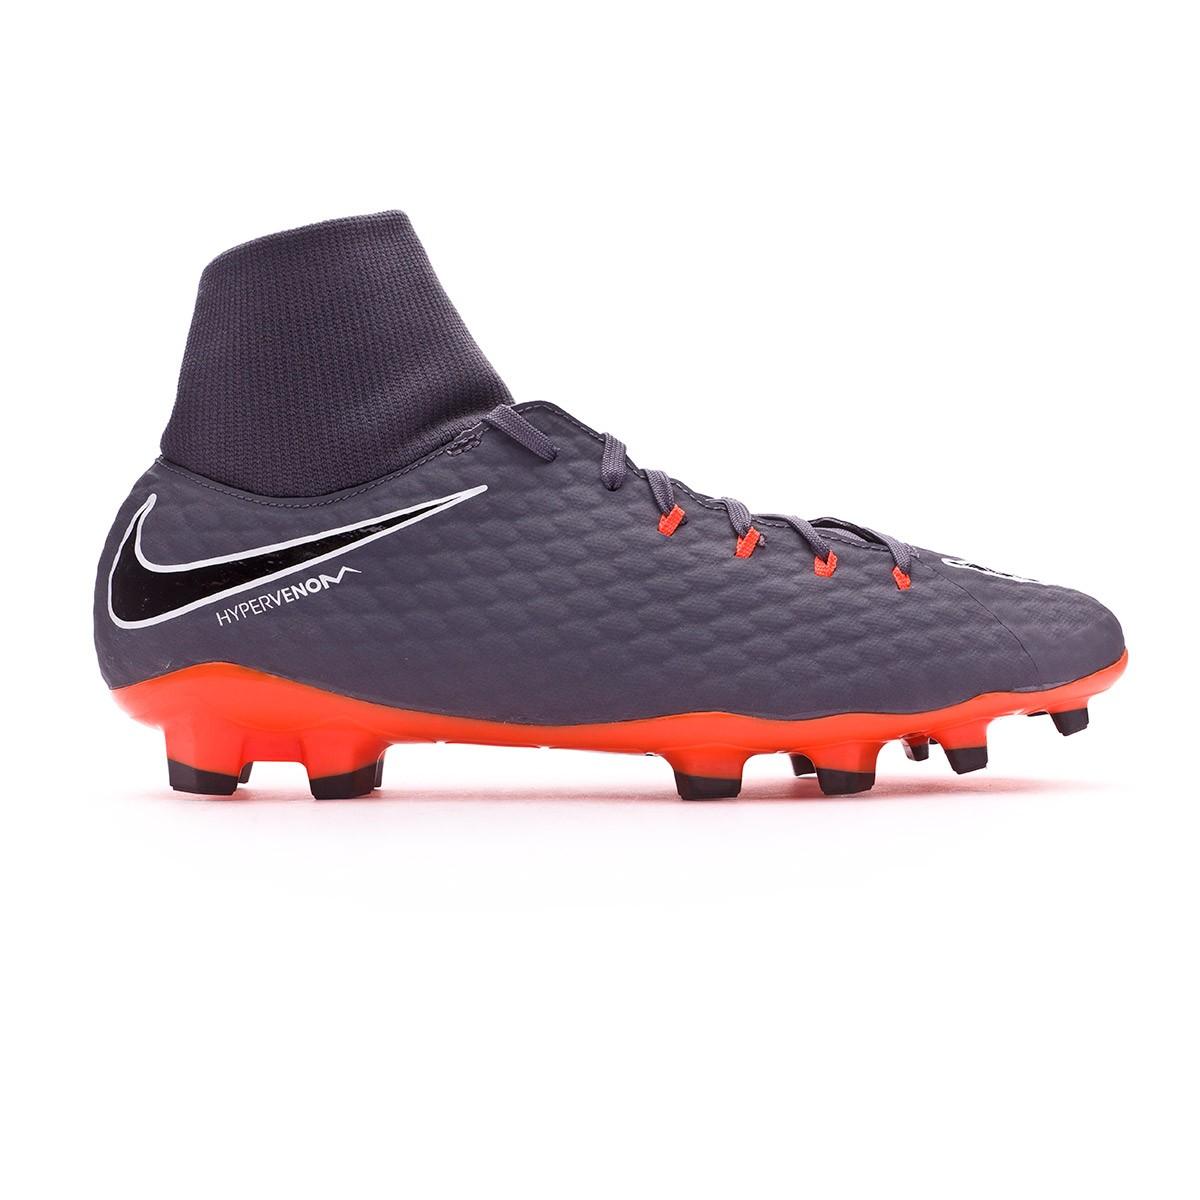 aac0e42eb Zapatos de fútbol Nike Hypervenom Phantom III Academy DF FG Dark grey-Total  orange-White - Tienda de fútbol Fútbol Emotion